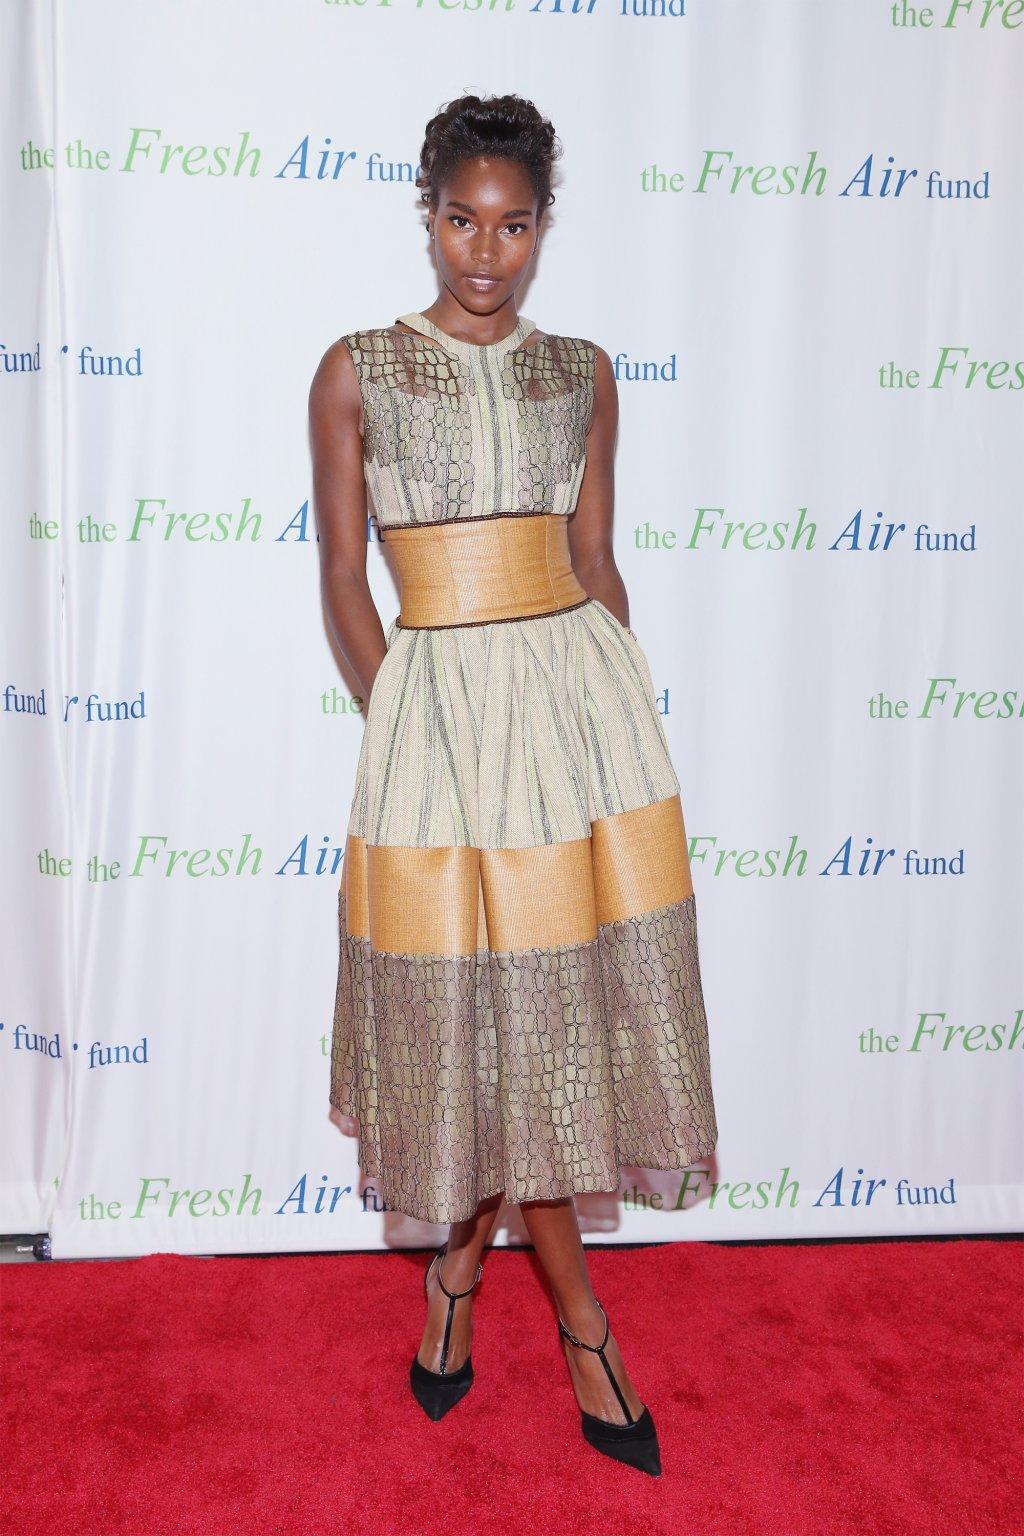 Fresh Air Fund 140th Birthday Celebration And 2016 Spring Benefit